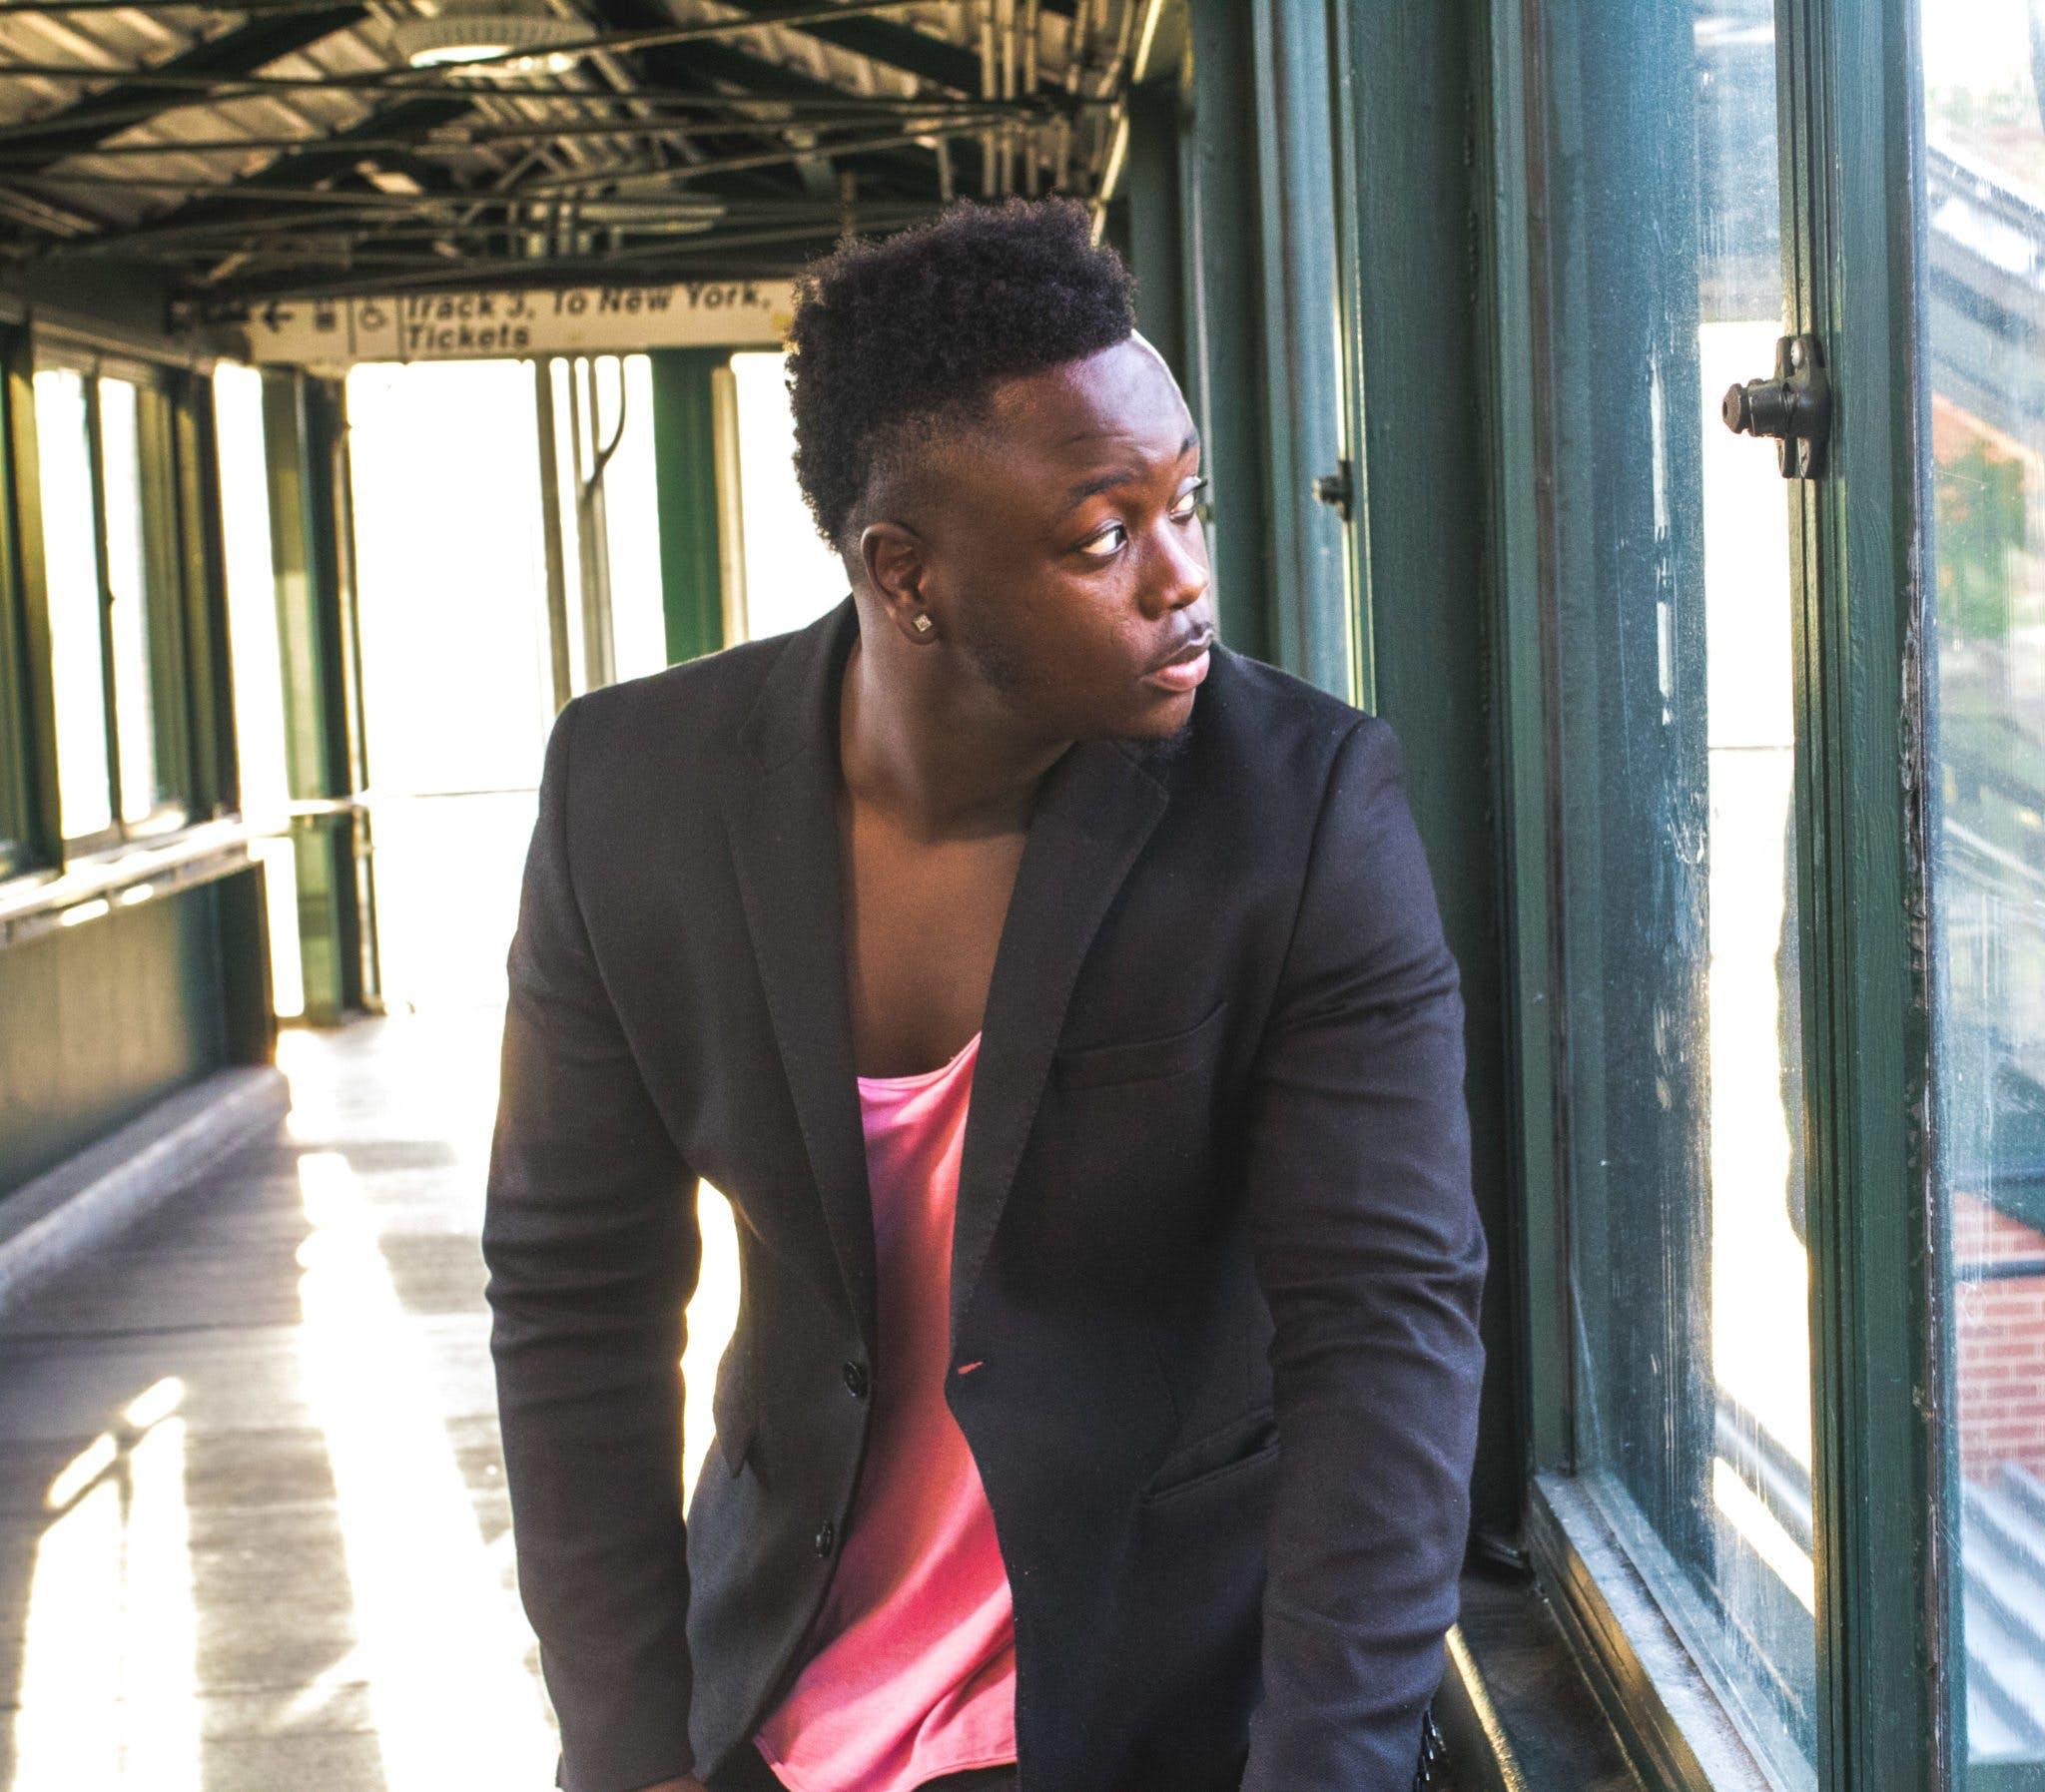 Kostenloses Stock Foto zu black male, drinnen, fashion, fenster